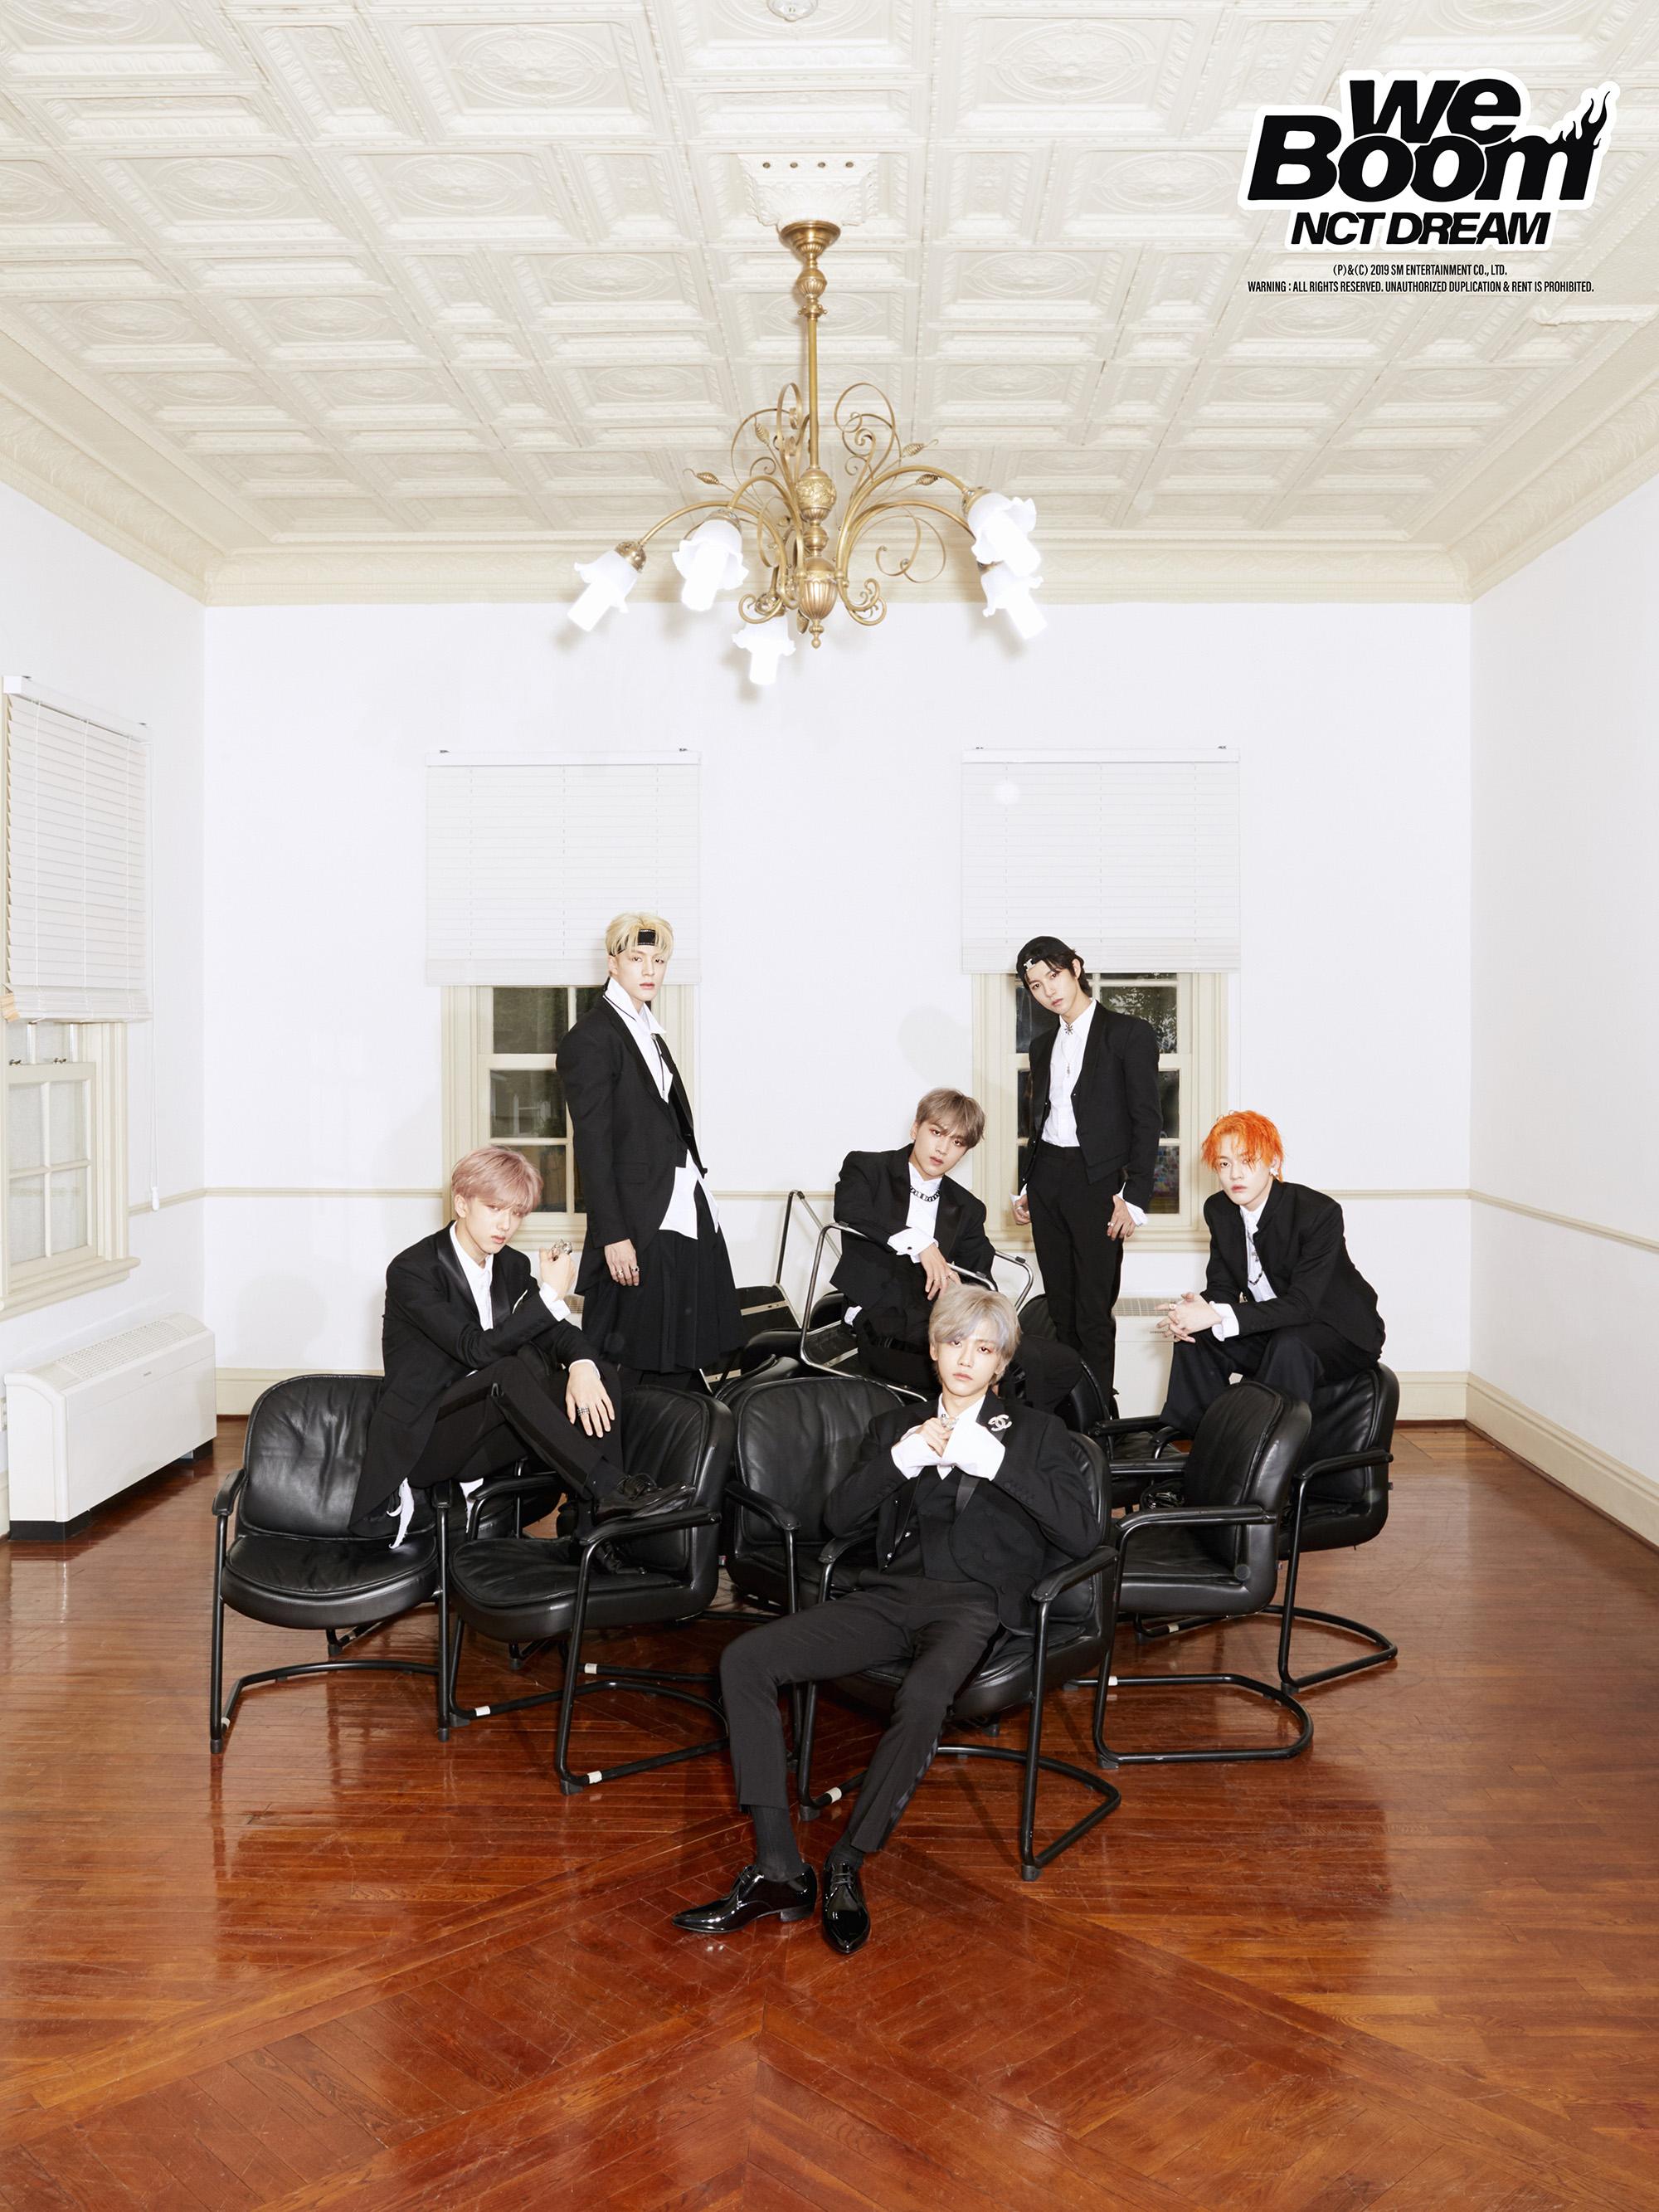 NCT DREAM新歌《BOOM》回归舞台于7月26号首播